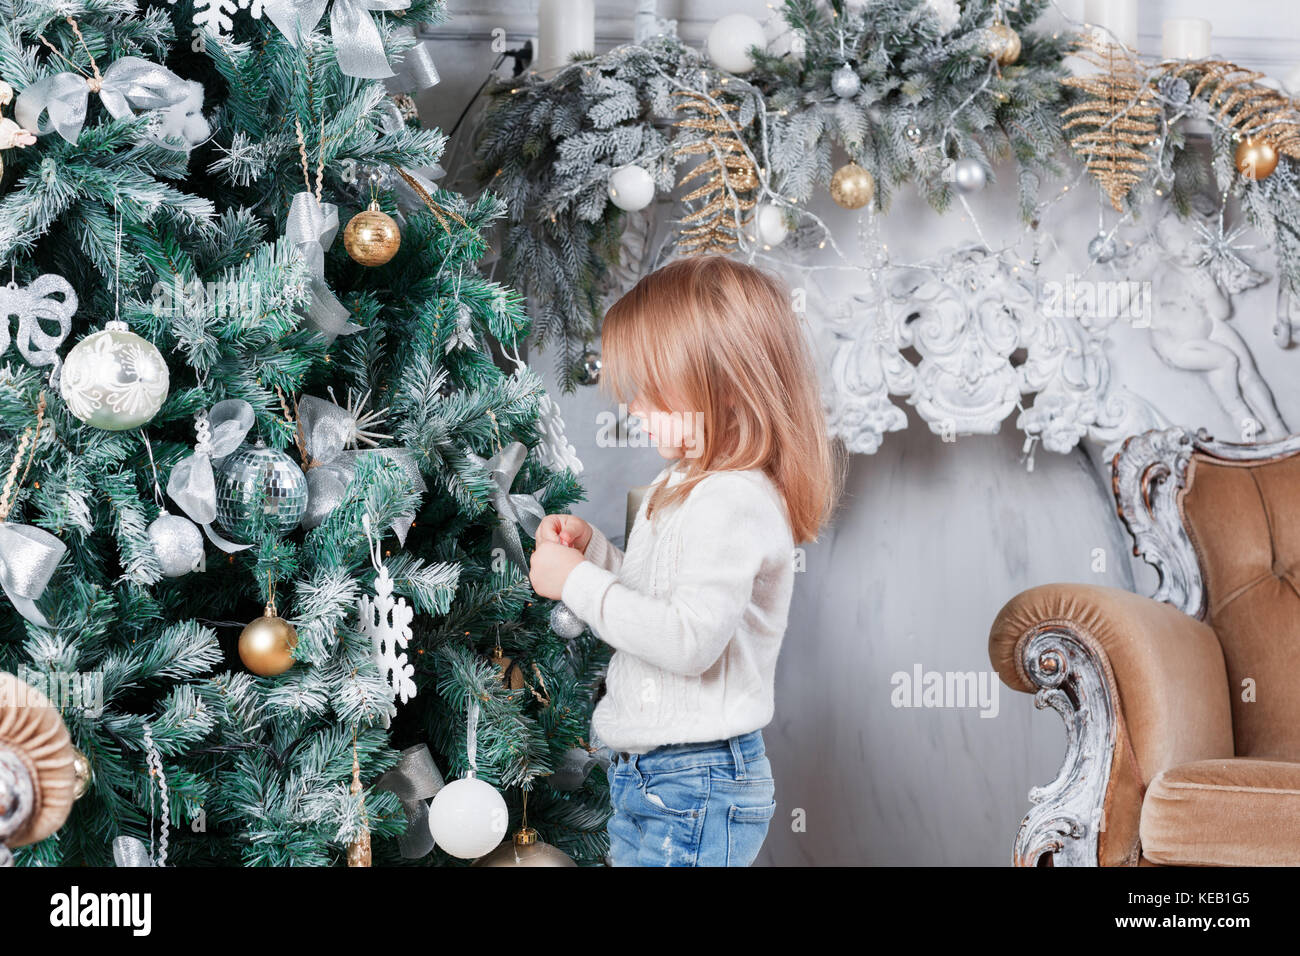 Baby Doll Stockfotos & Baby Doll Bilder - Seite 3 - Alamy